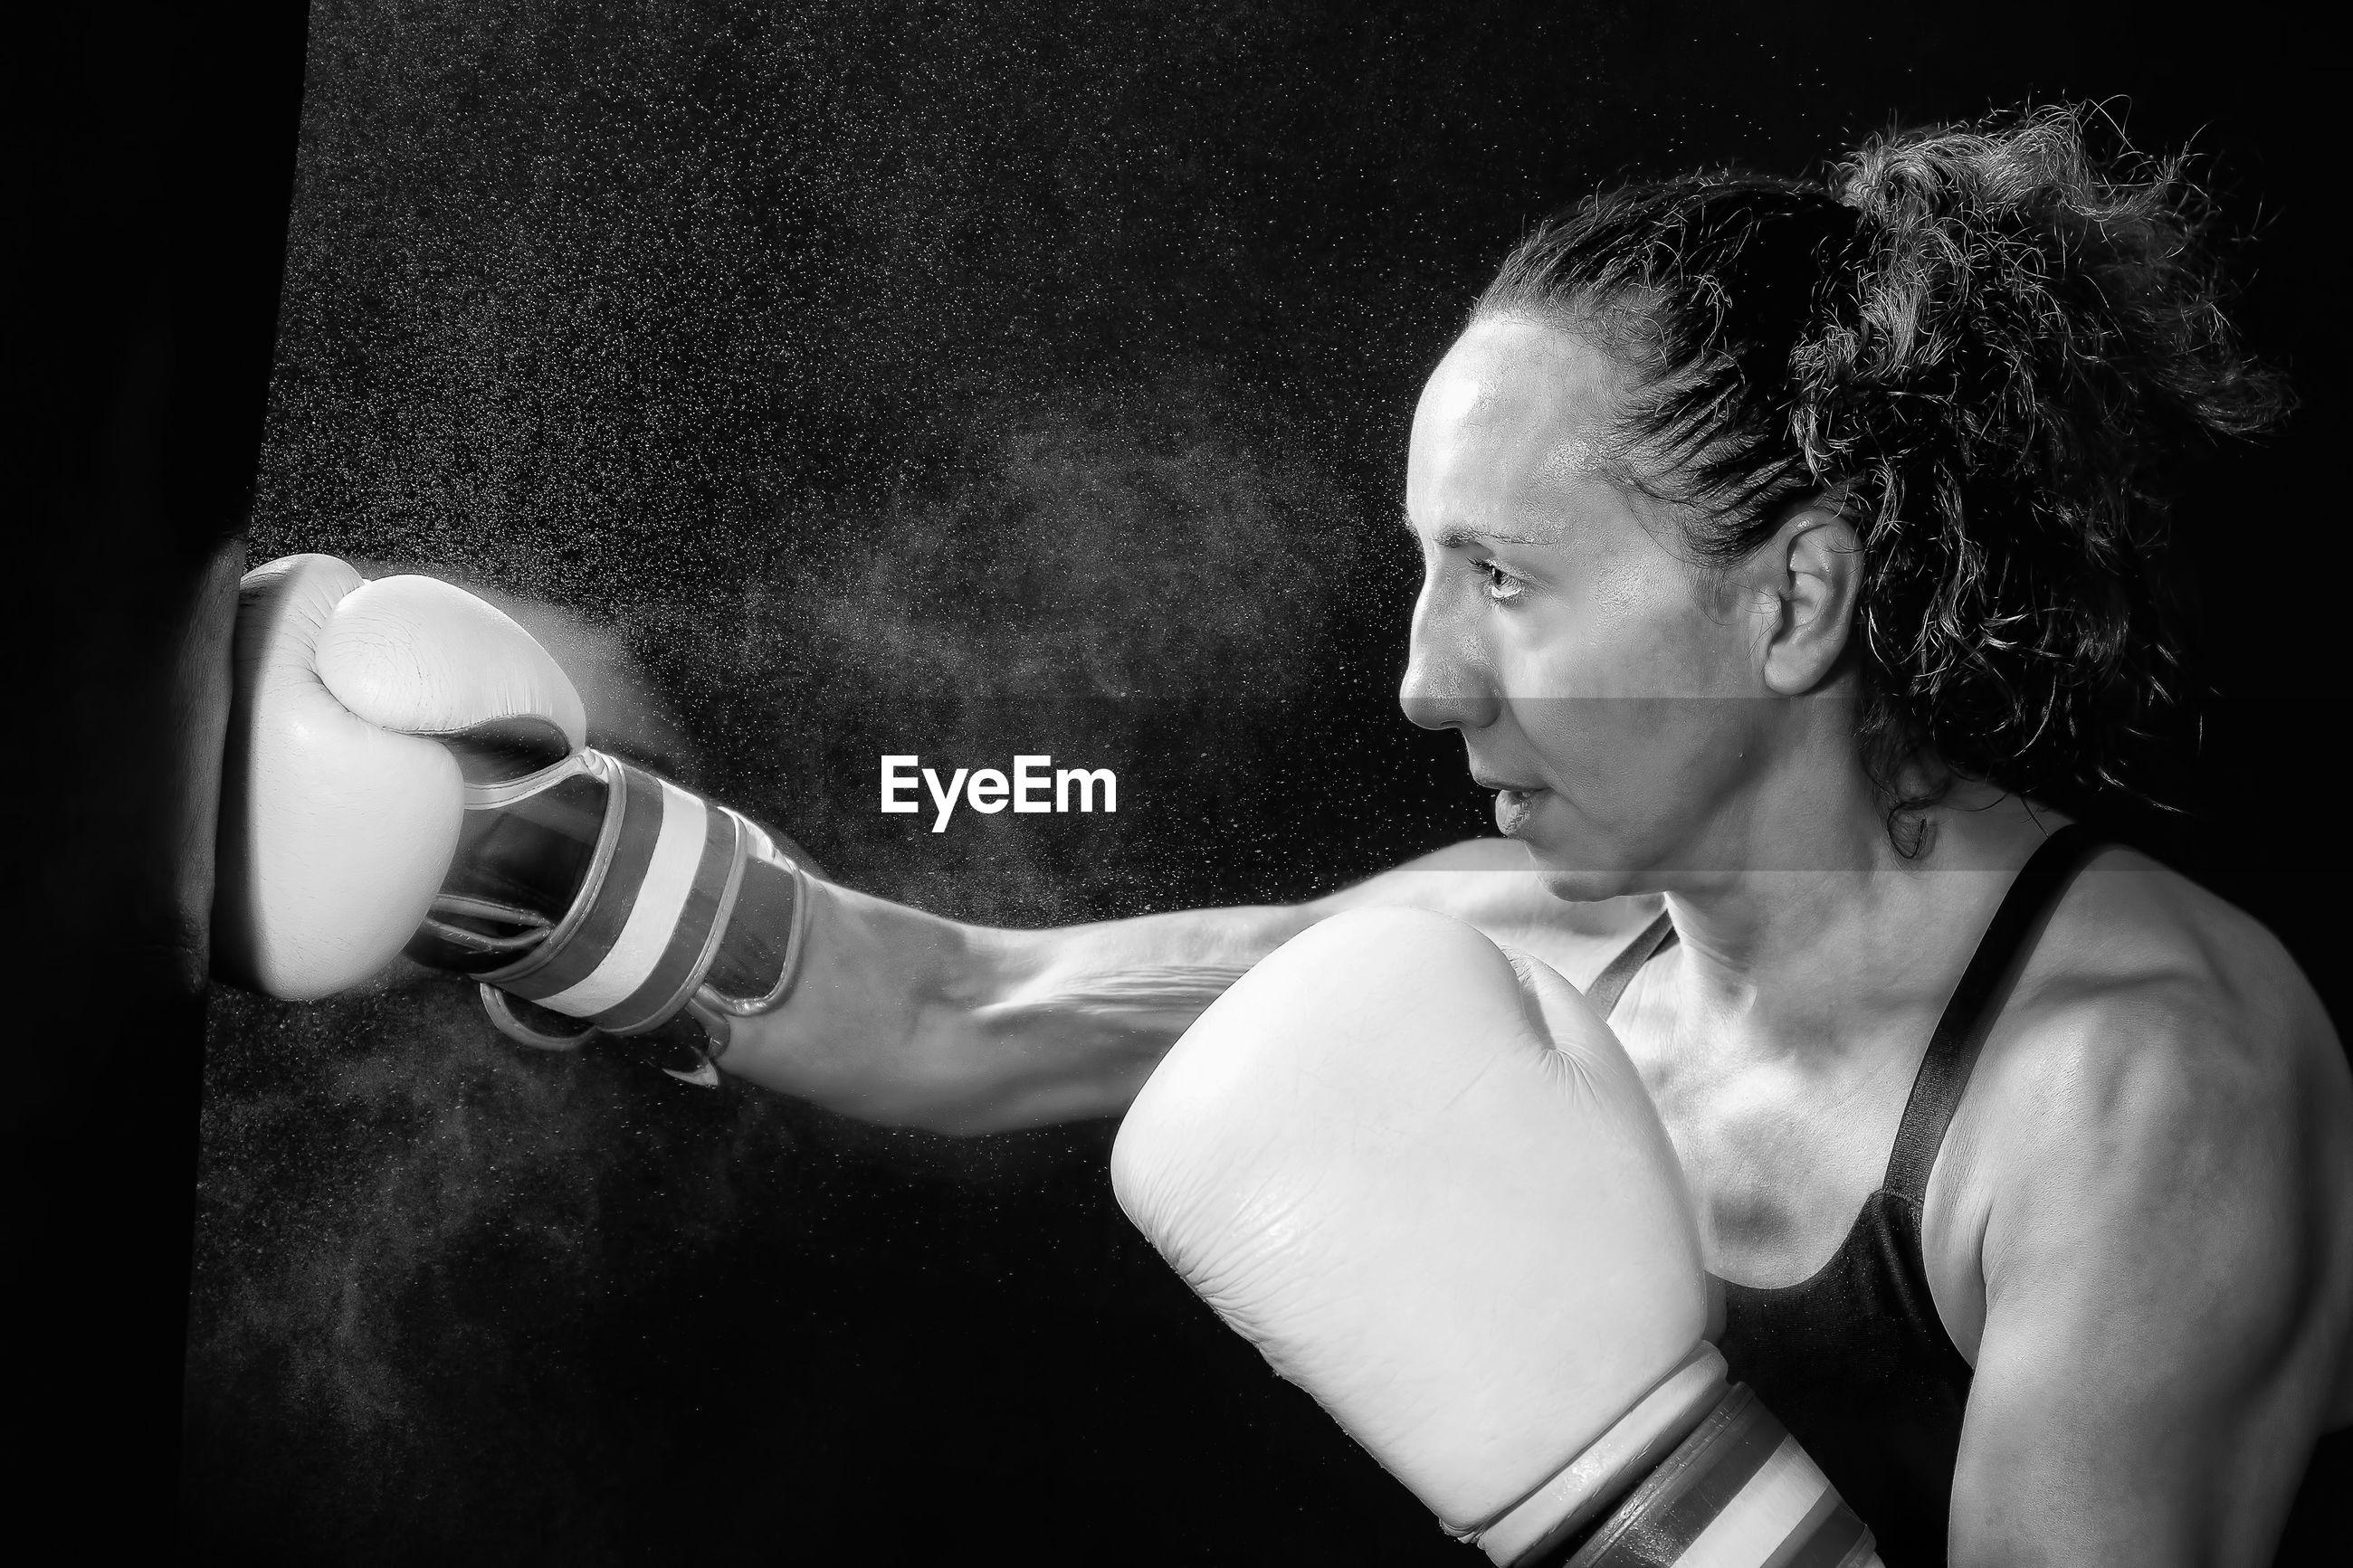 Female boxer punching bag against black background